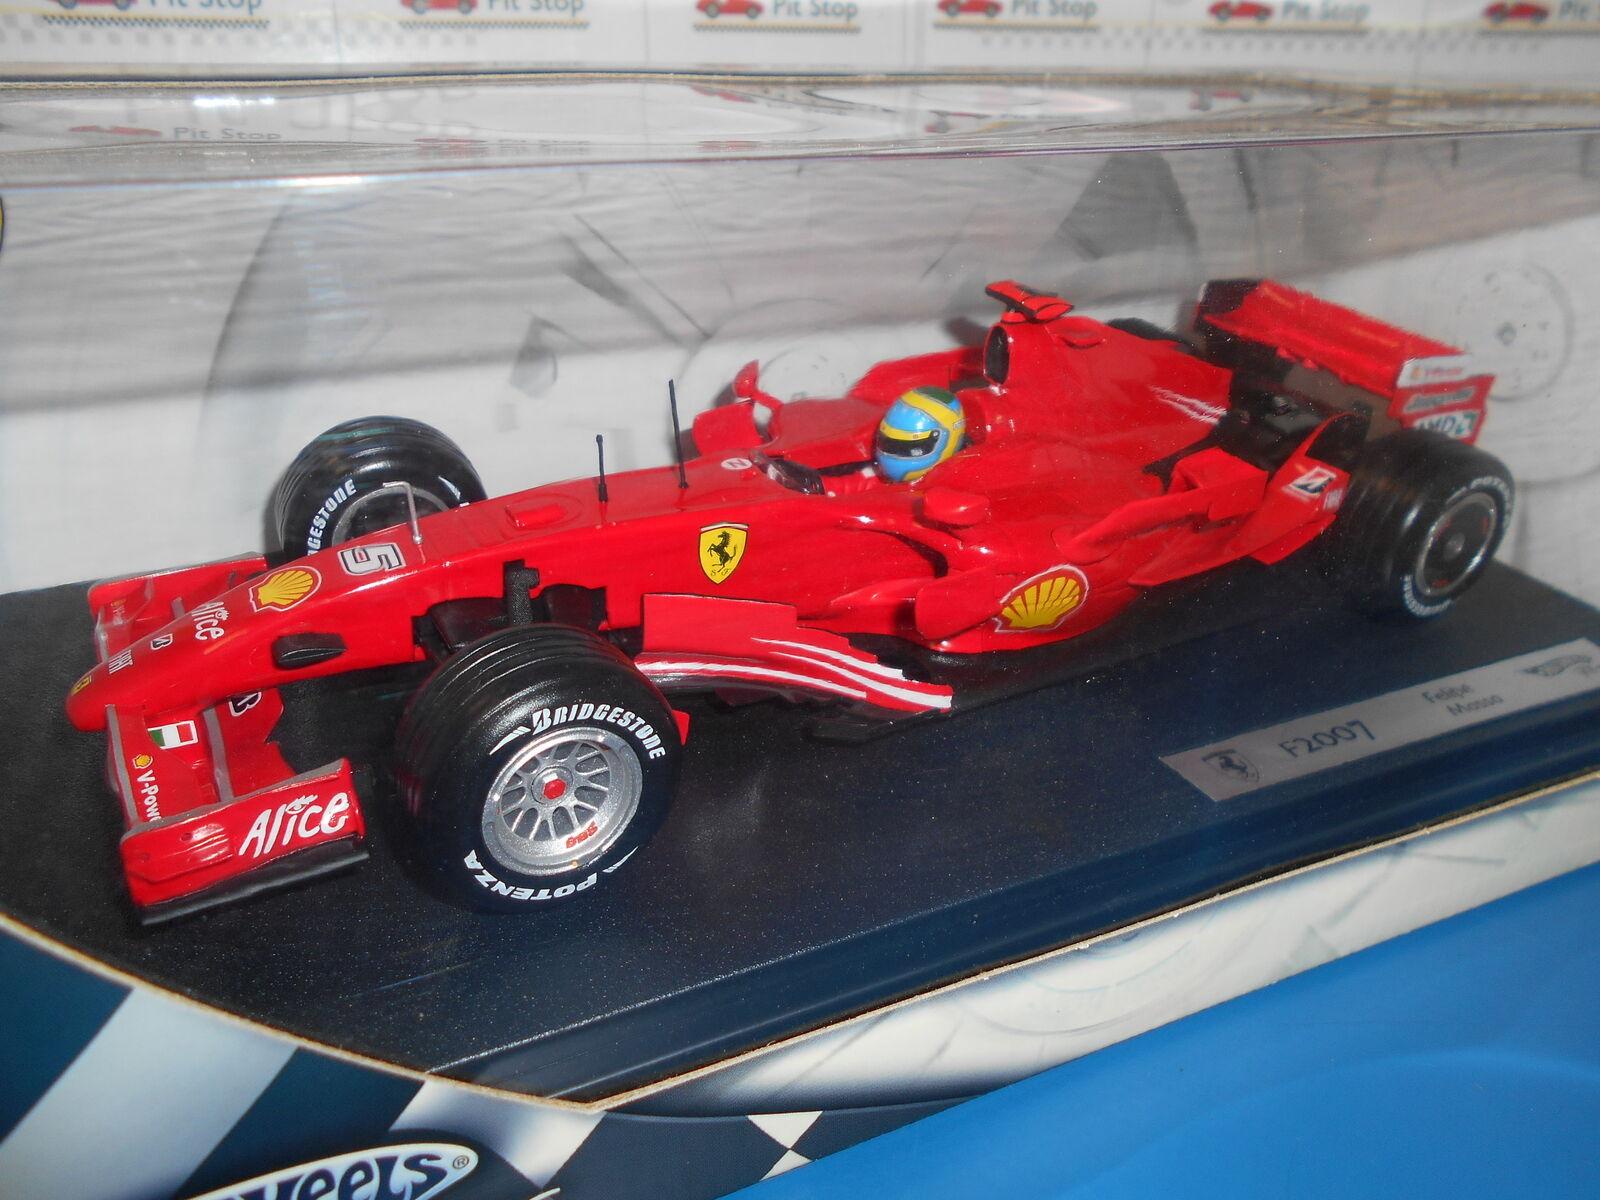 per offrirti un piacevole shopping online HWK6630 by caliente ruedaS ruedaS ruedaS FERRARI F2007  5 F.MASSA 1 18  a buon mercato